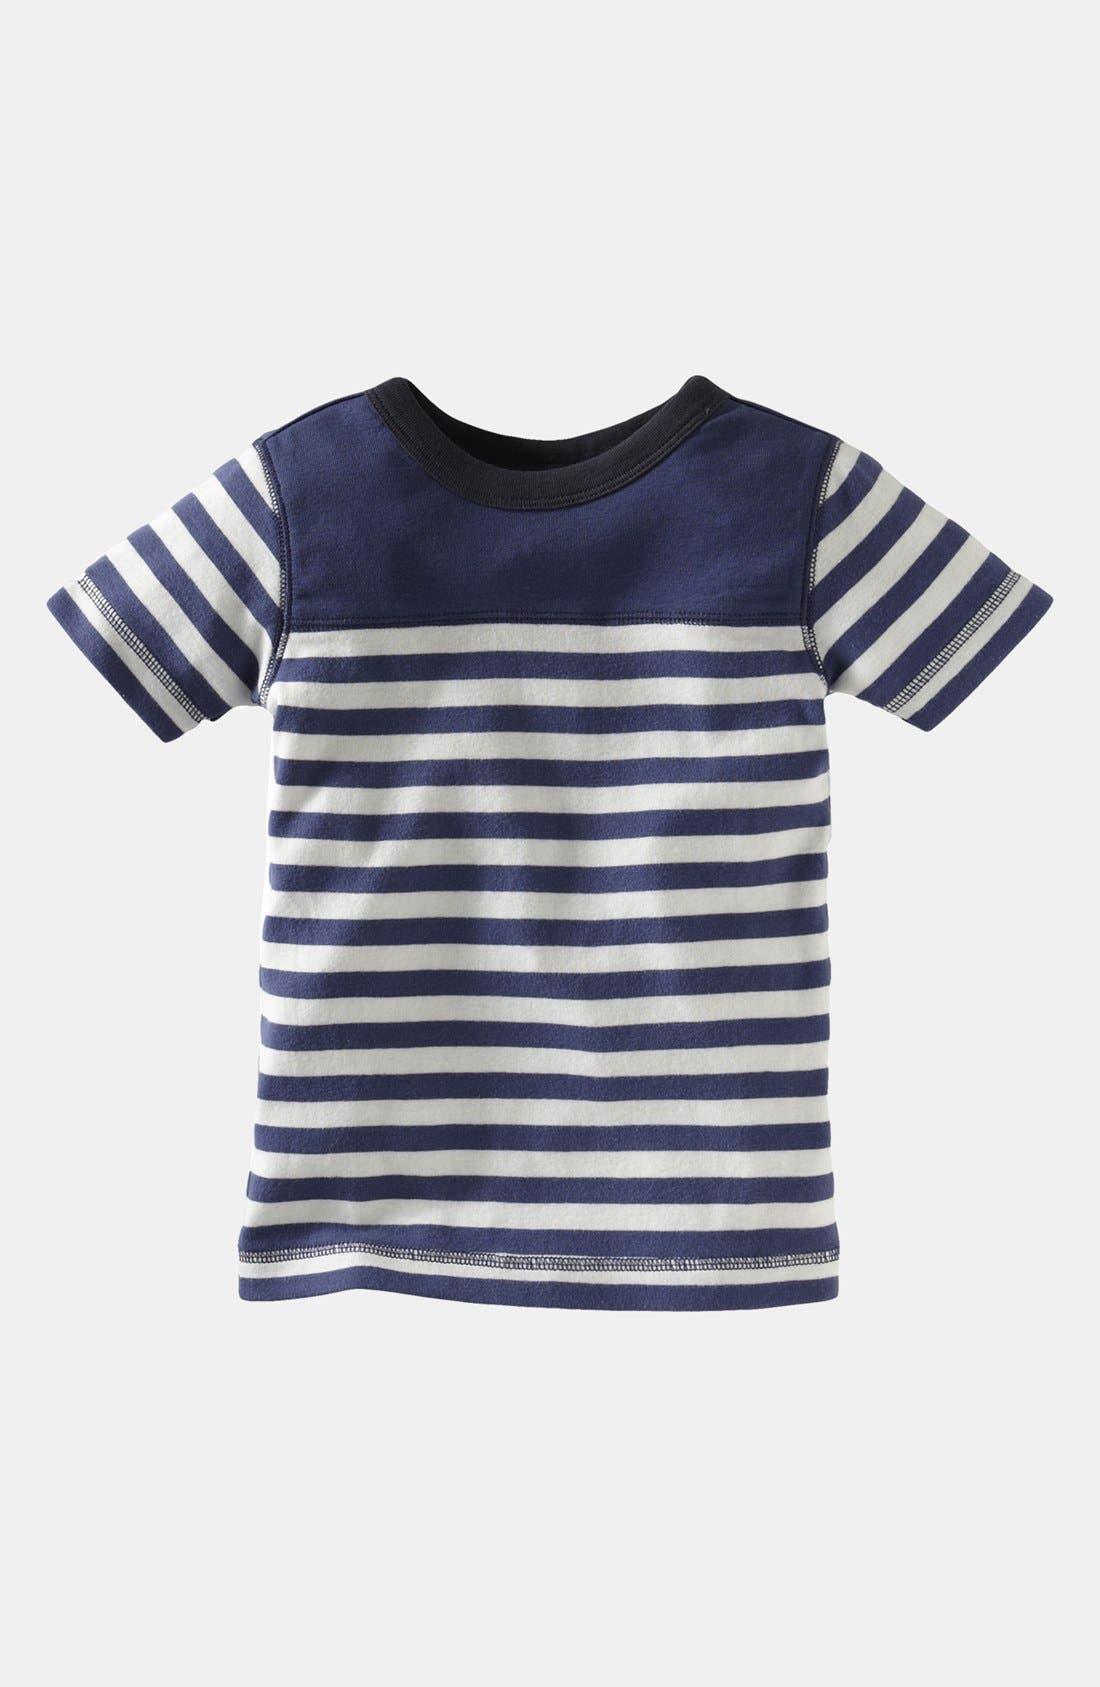 Alternate Image 1 Selected - Tea Collection 'Coastal Stripe' T-Shirt (Toddler)